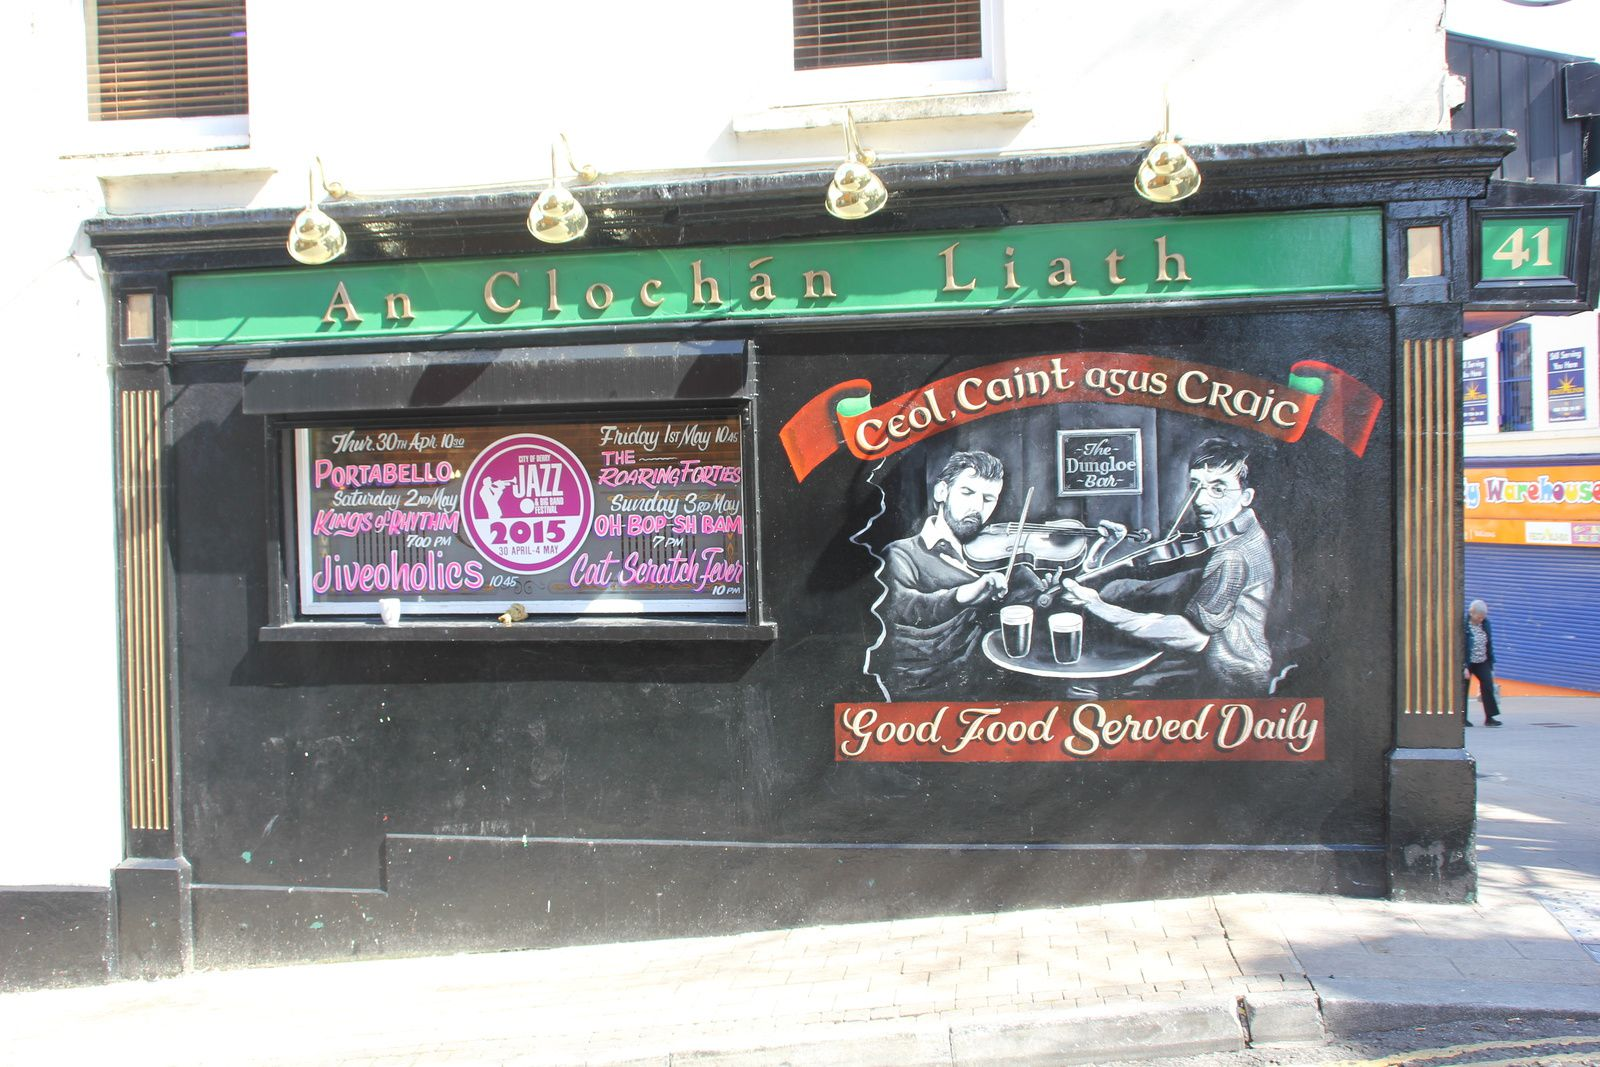 561) Derry Center